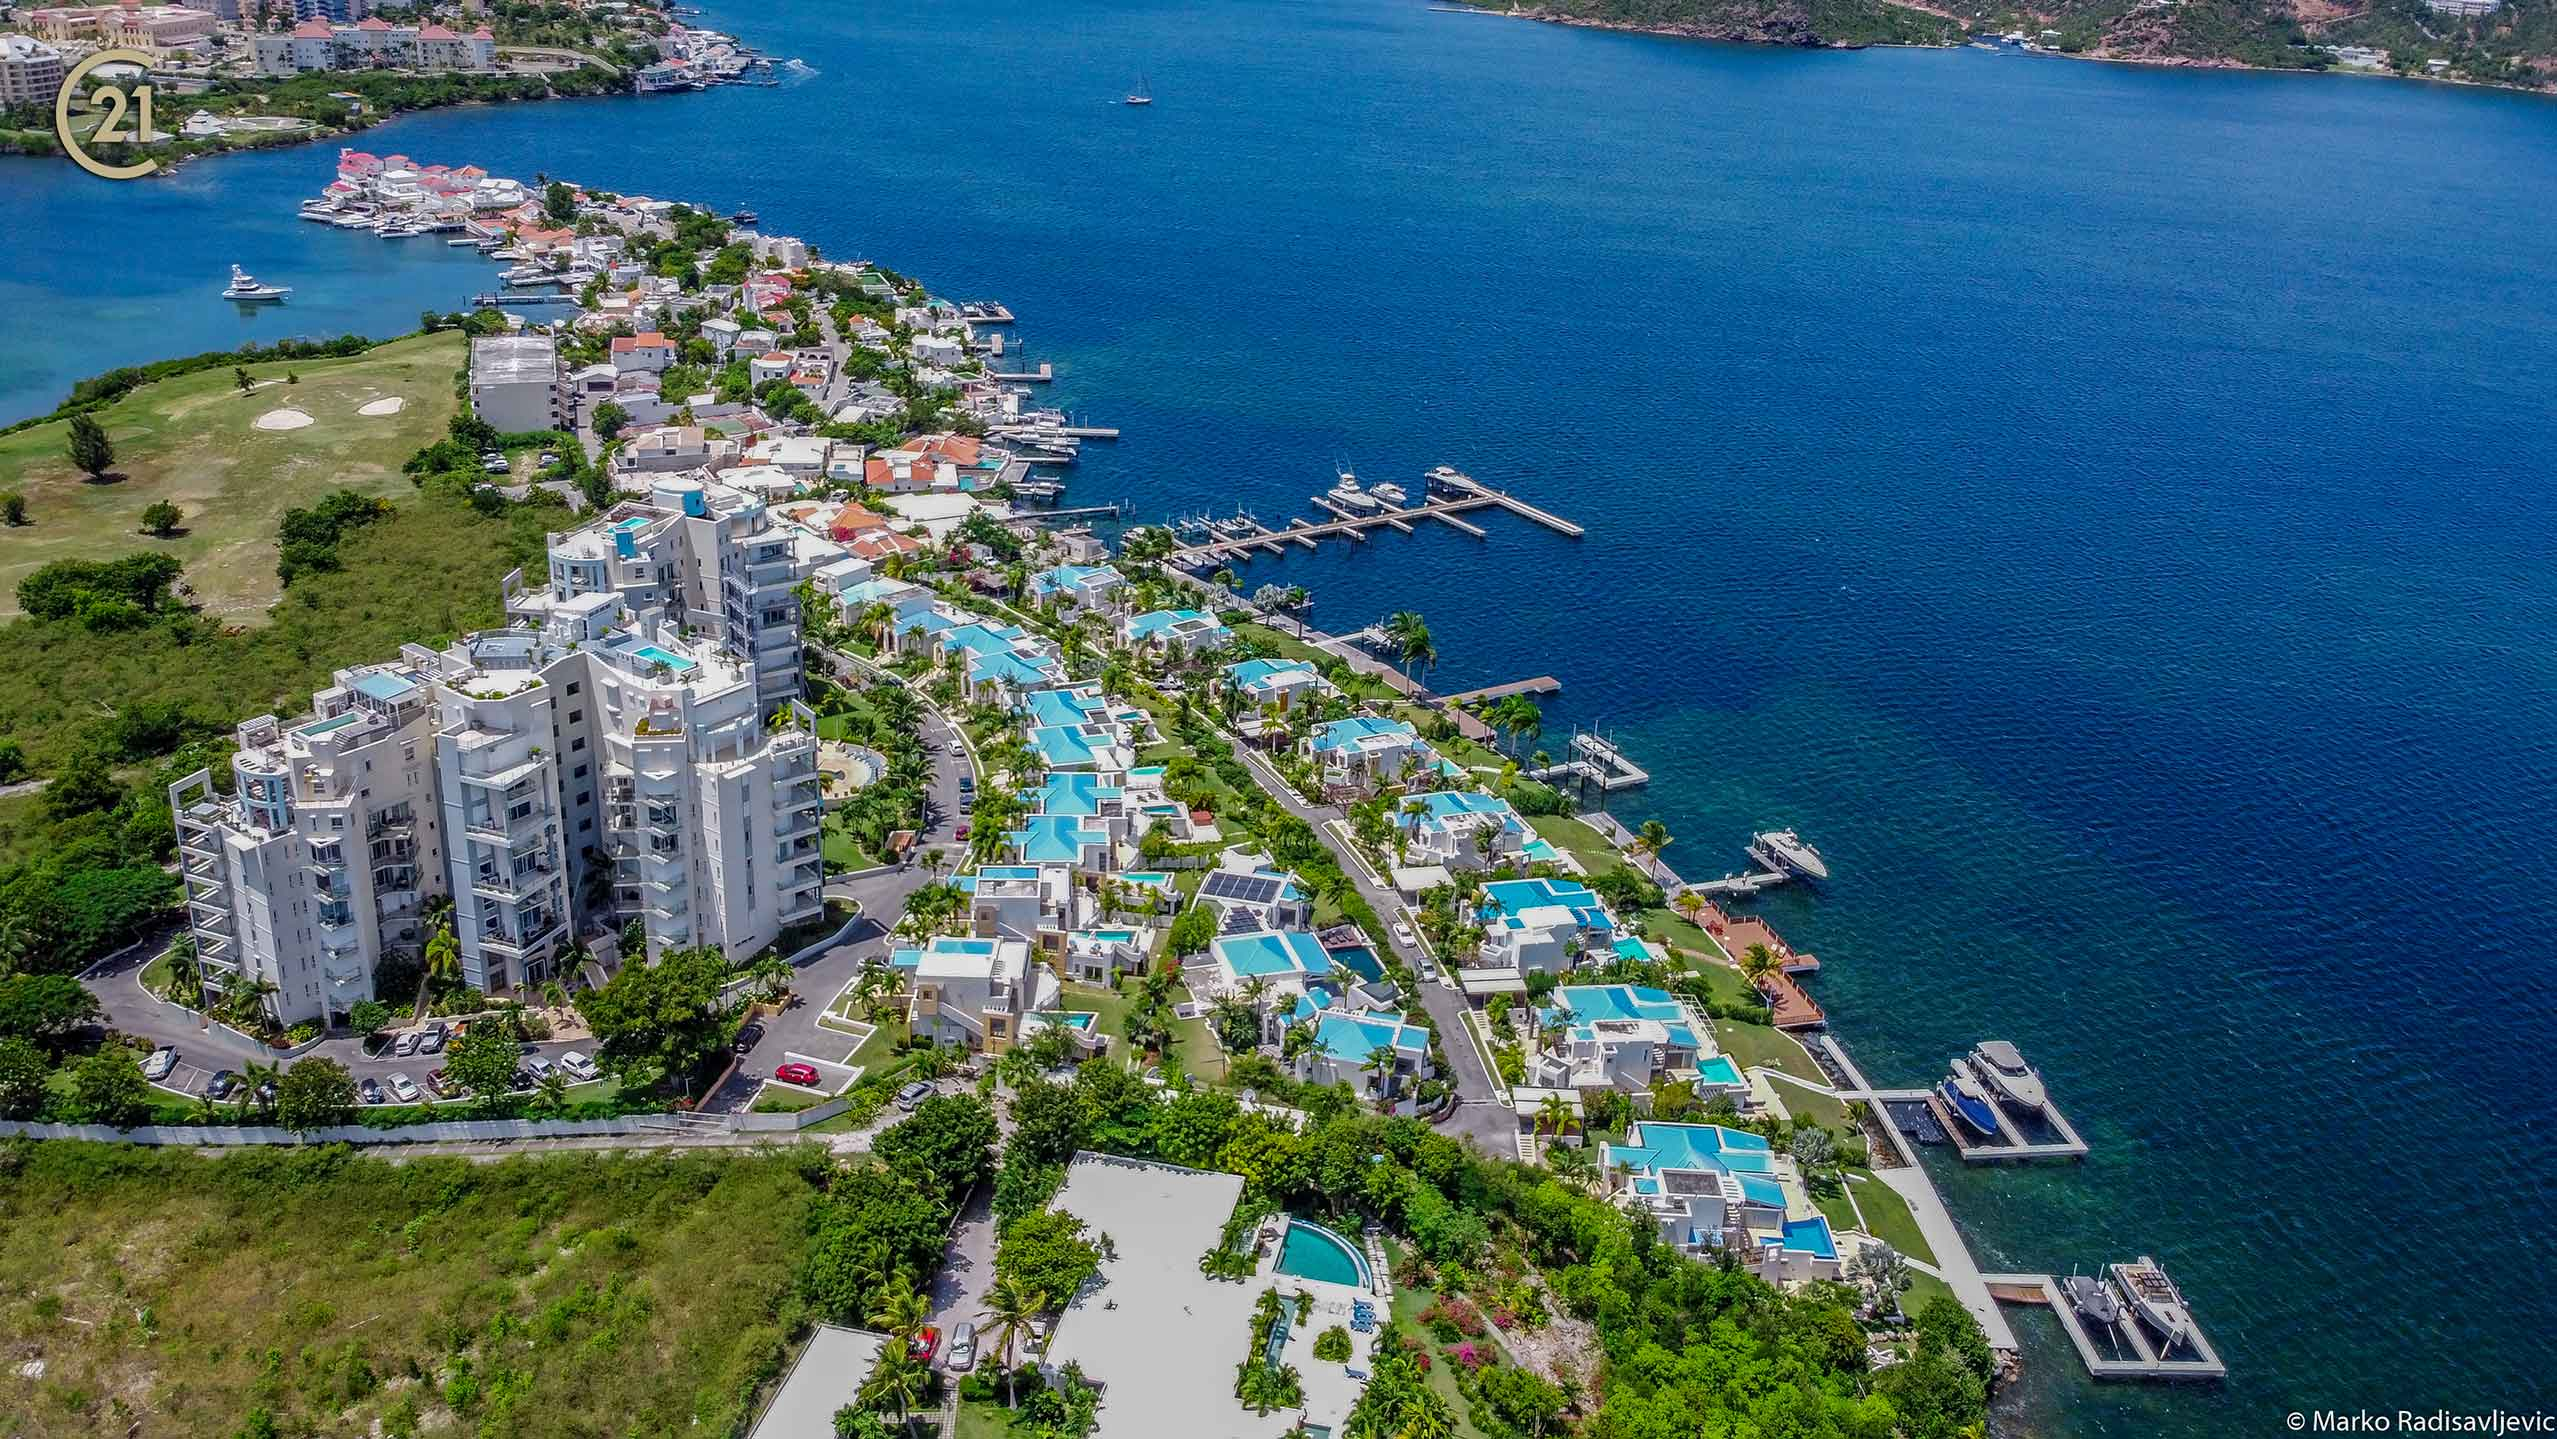 Aqua Marina Luxury Villa